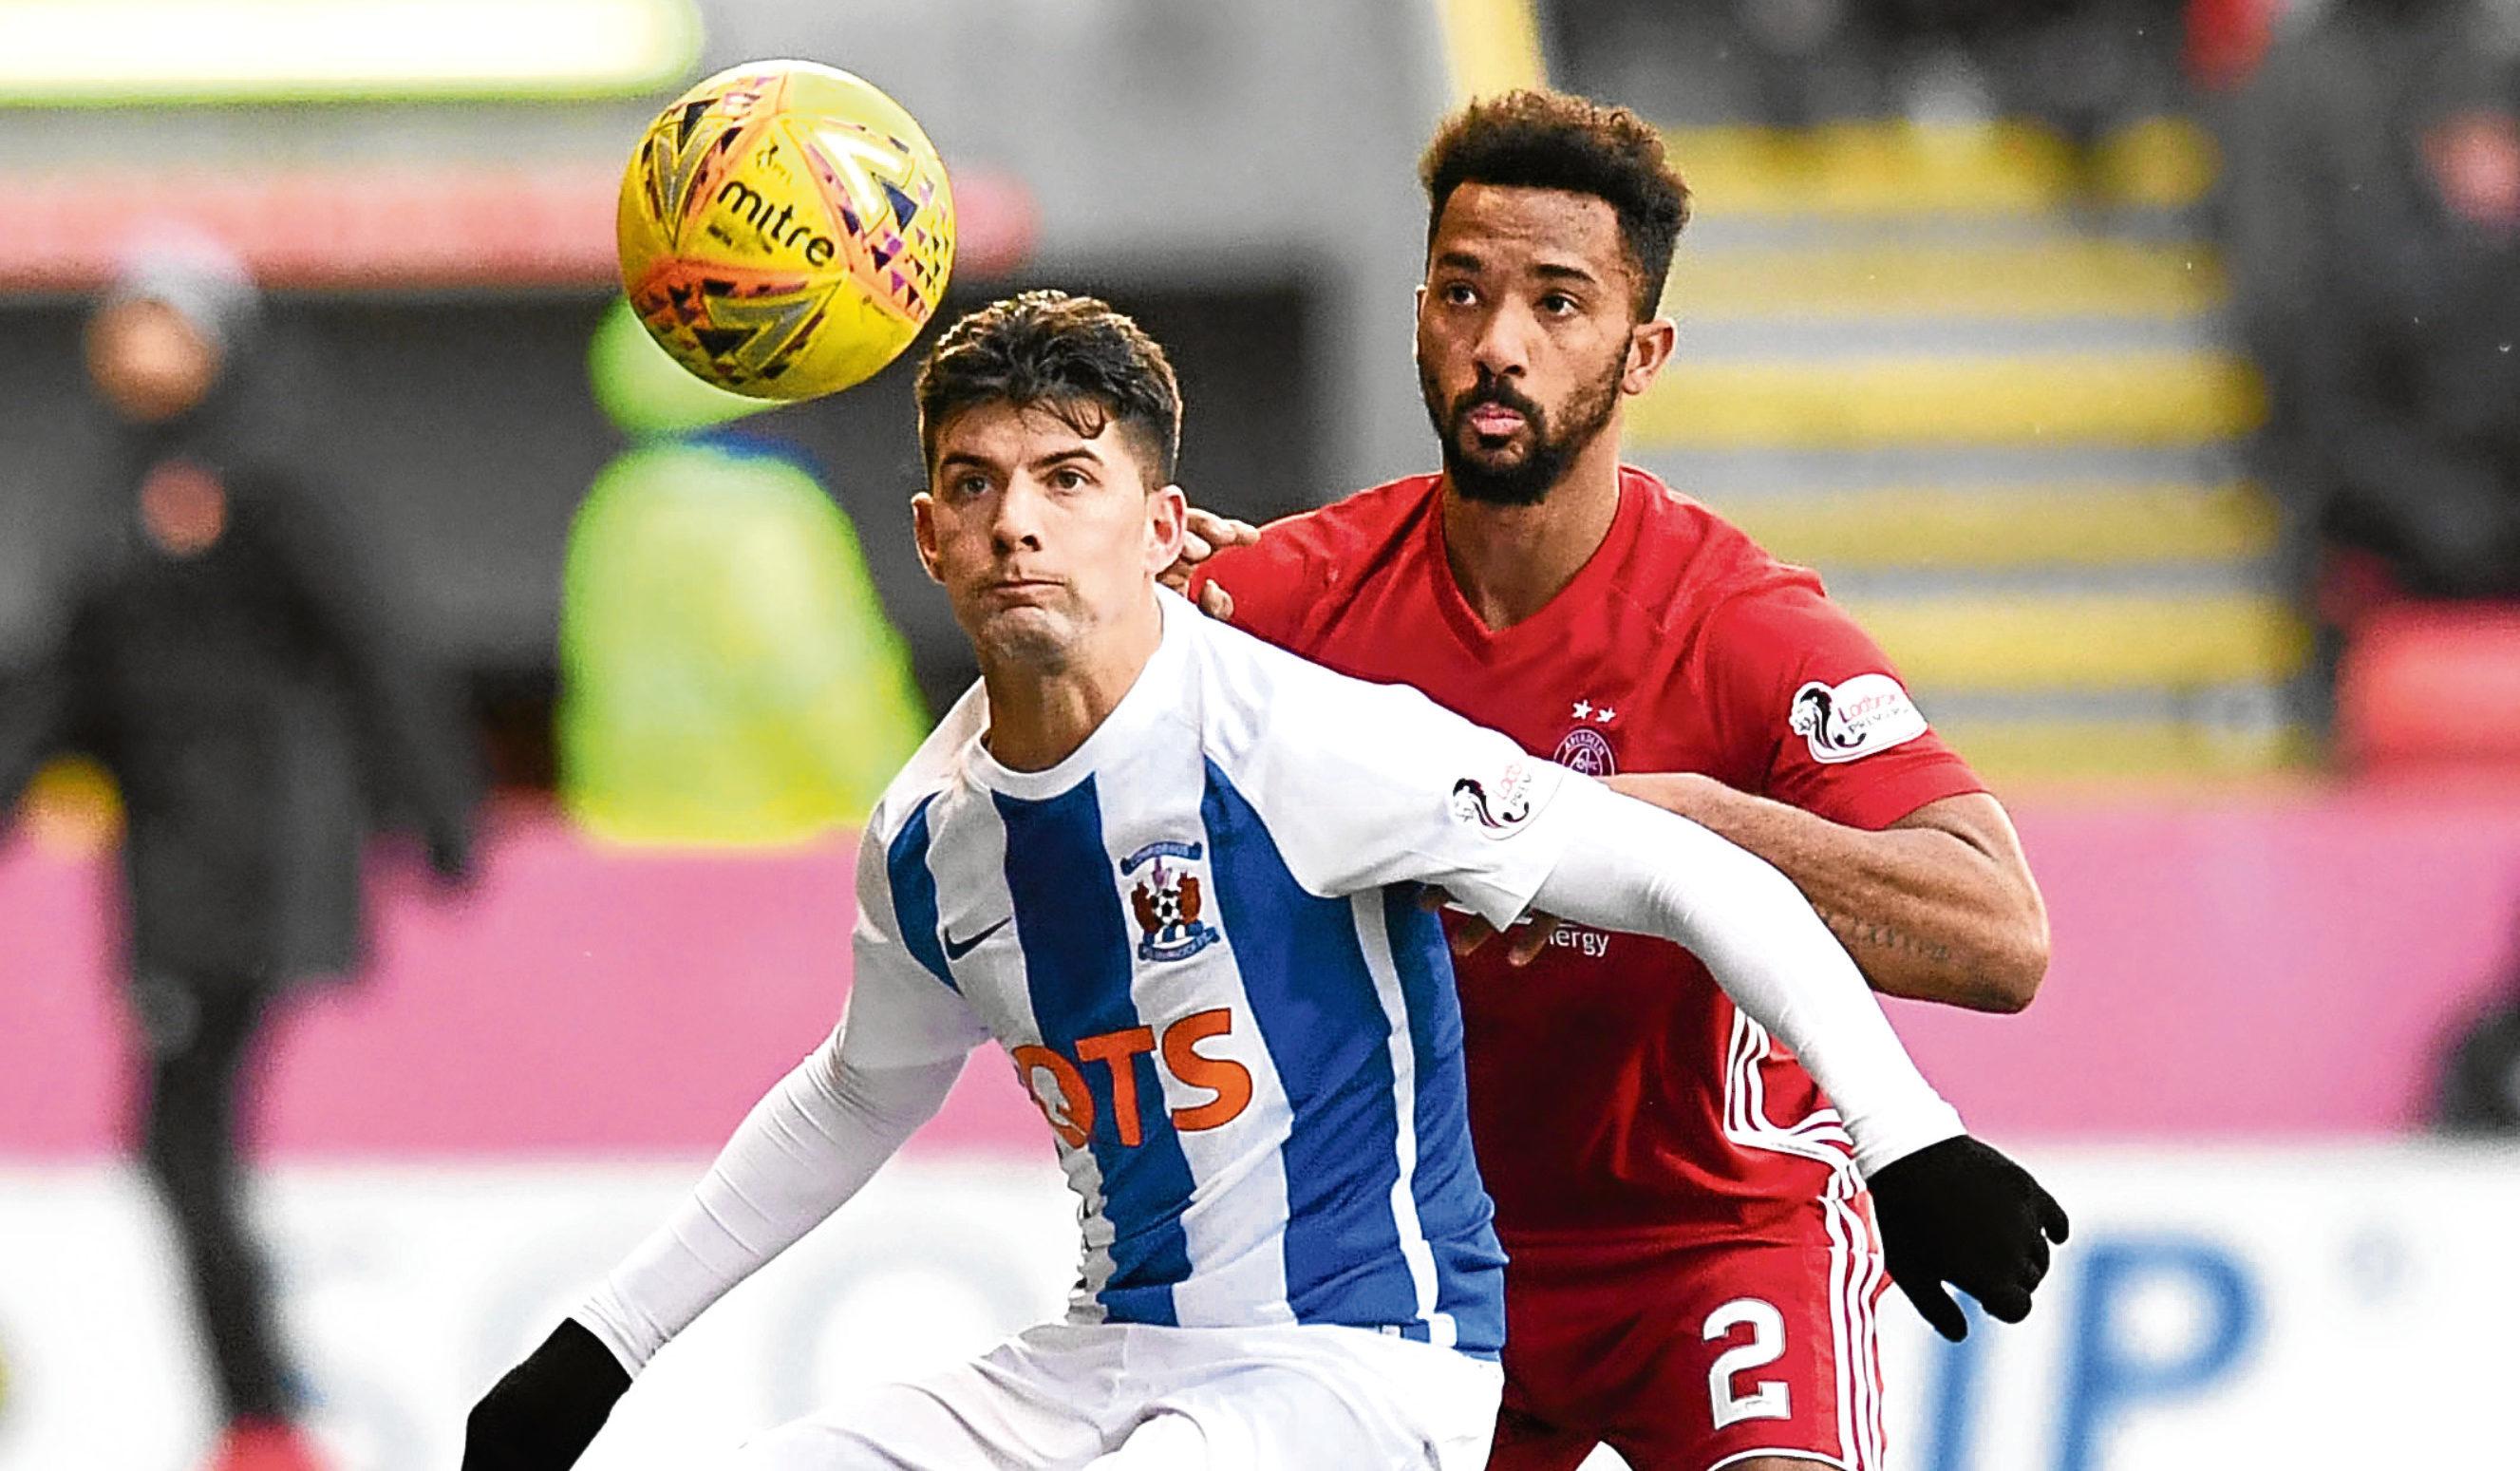 The Dons return to league duty against Kilmarnock on Saturday.